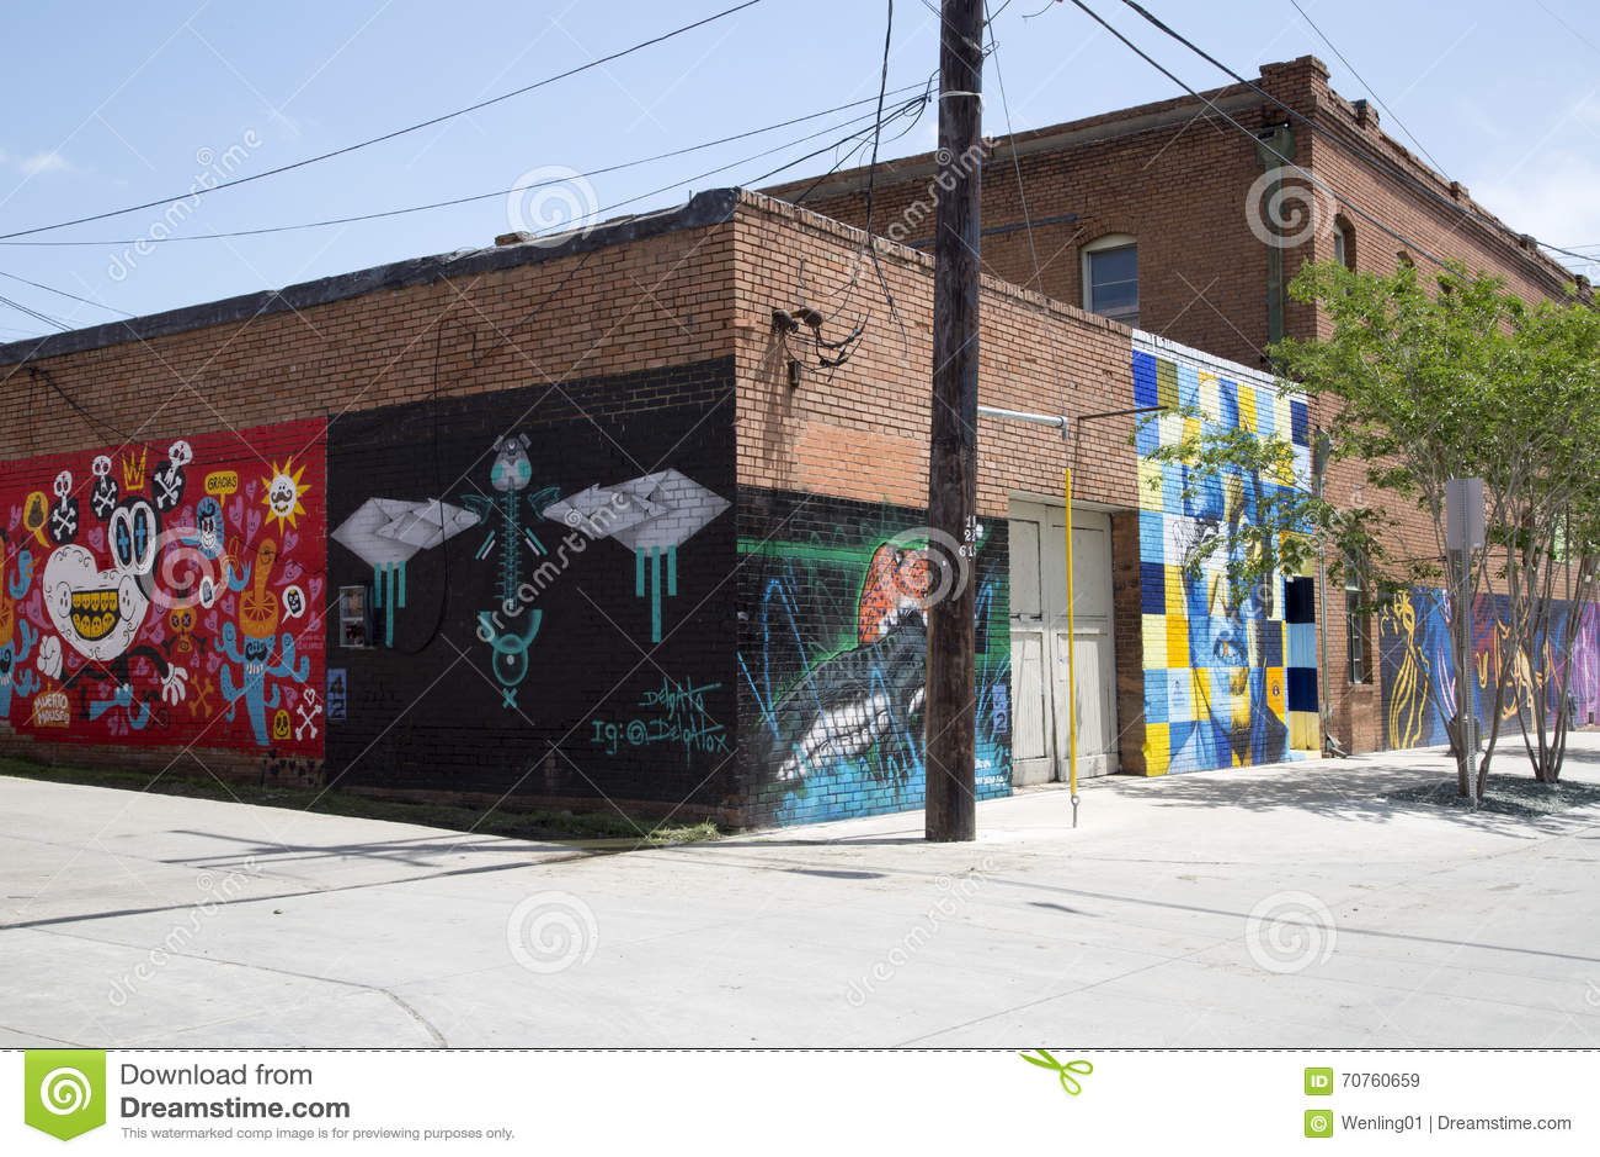 Graffiti wall dallas - Group Graffiti On The Wall Of Building Royalty Free Stock Images